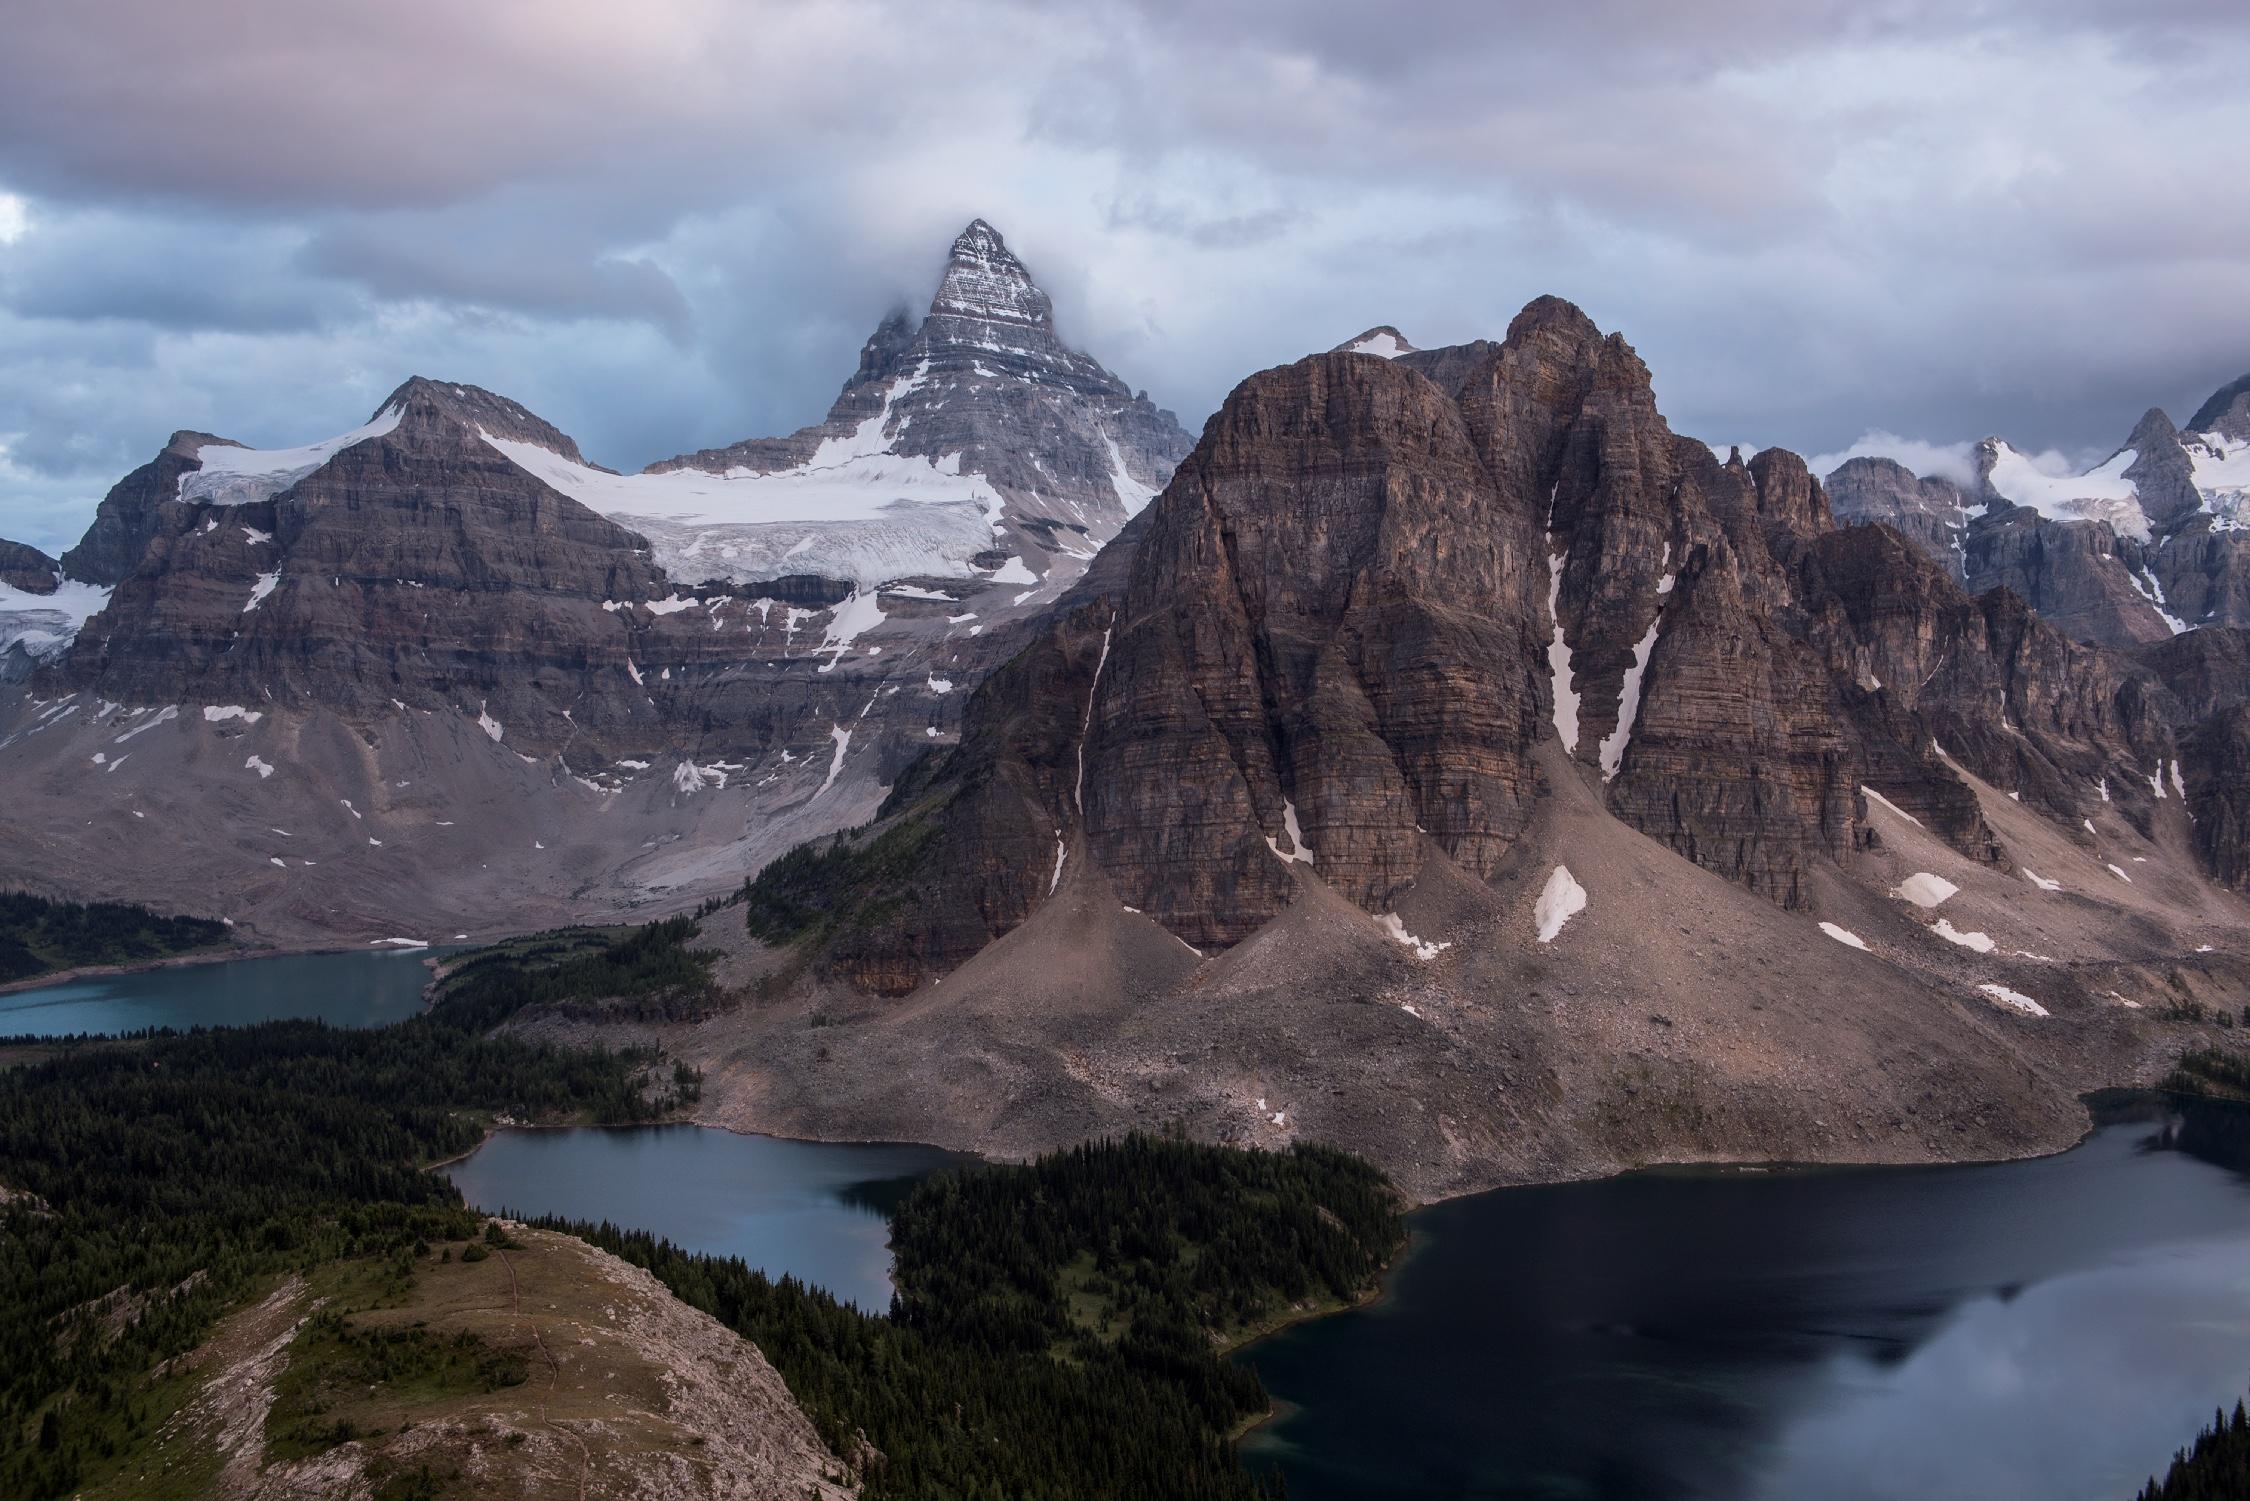 Hiking in Mount Assiniboine Provincial Park